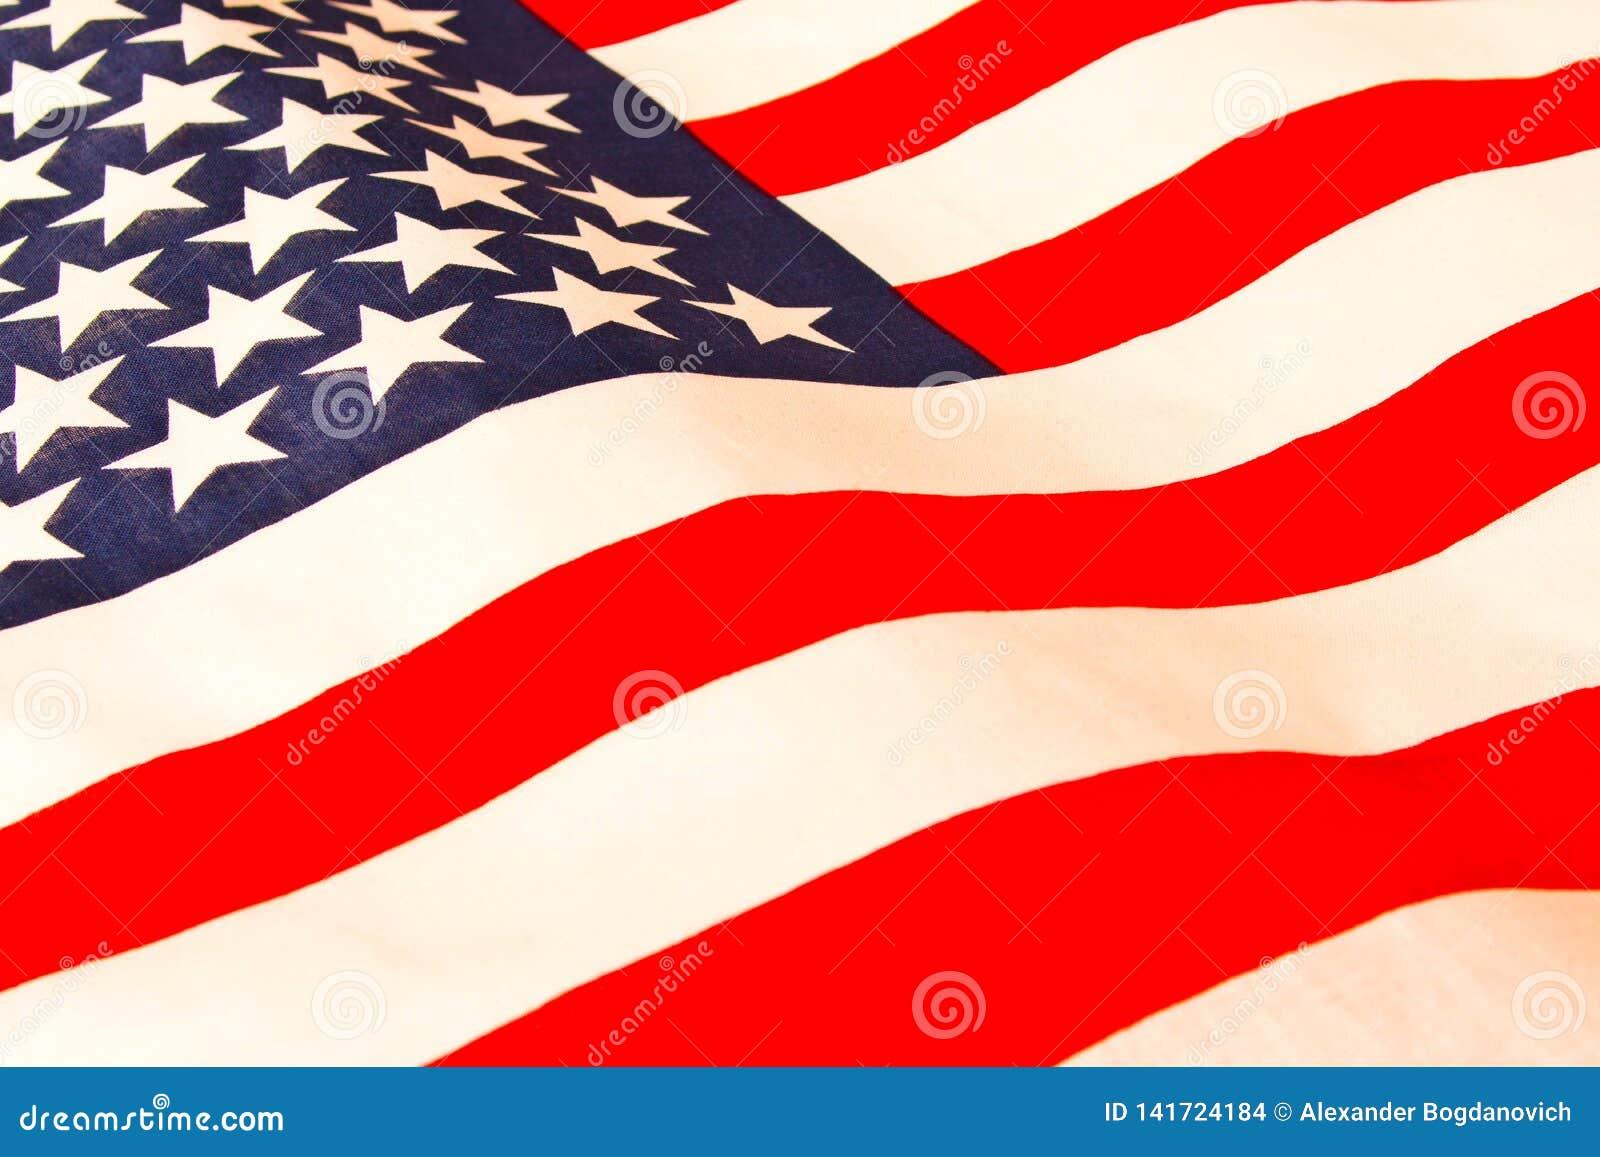 Amerykańska flaga z bliska Flaga amerykańskiej tło Pojęcie patriotyzm